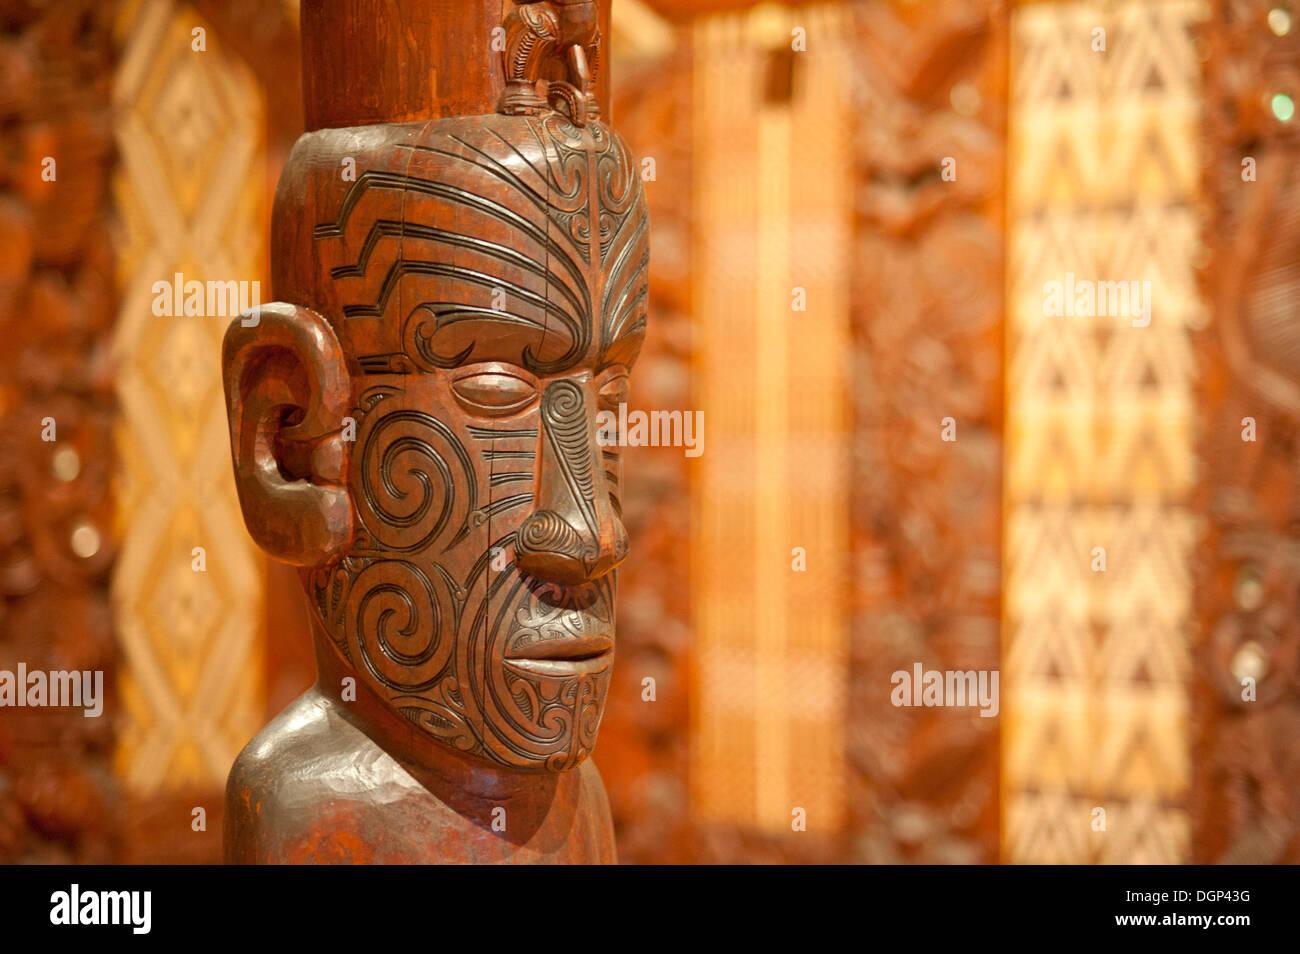 Traditional Maori carving at a communal house, Waitangi, New Zealand - Stock Image